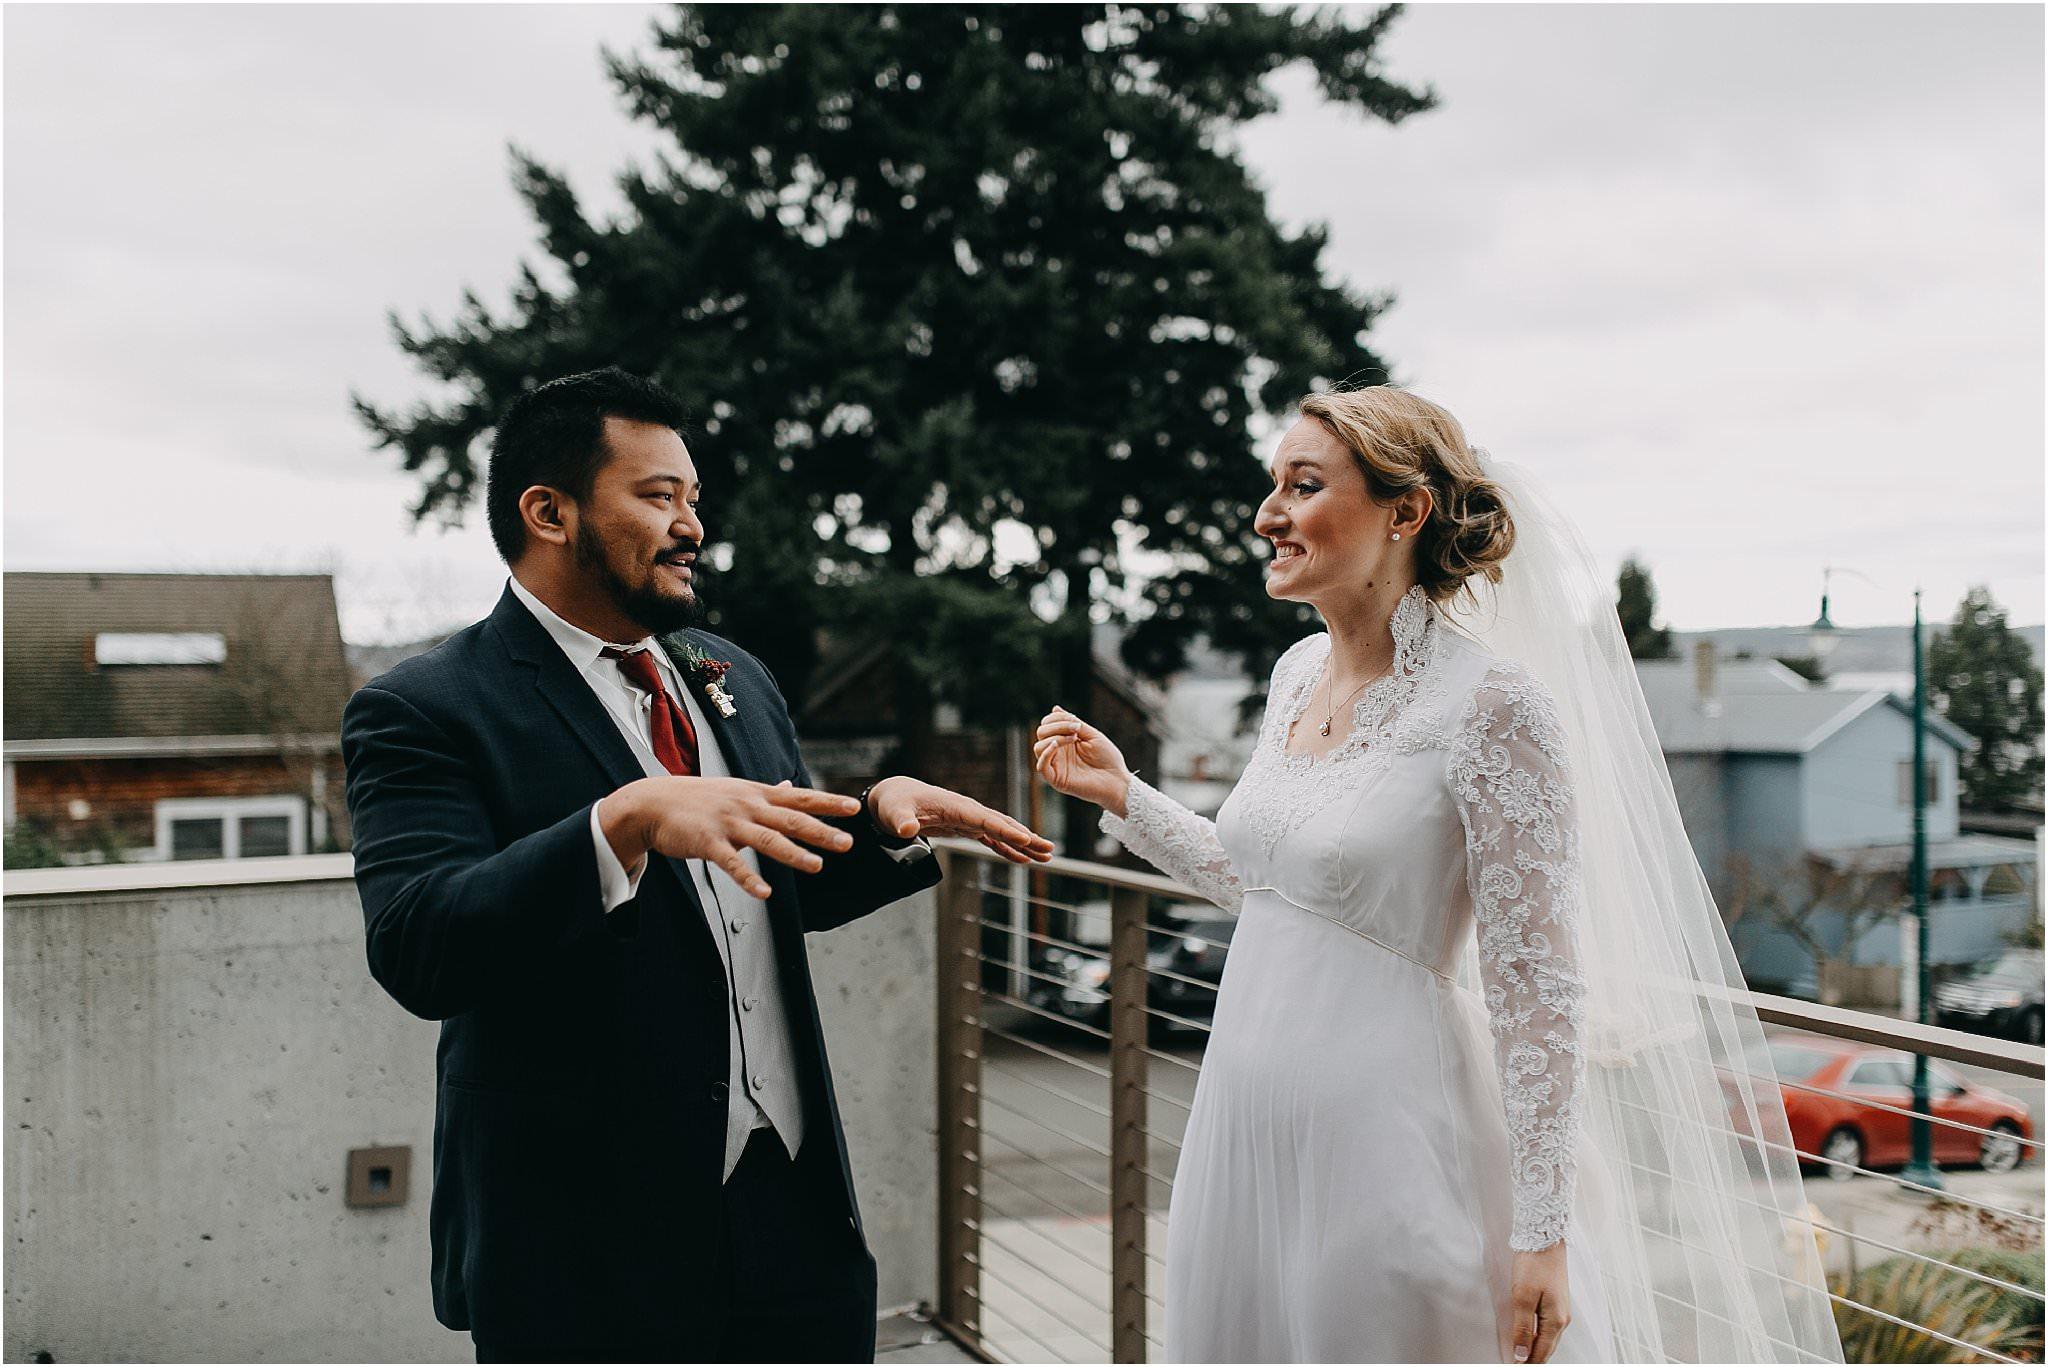 katy-robin-married-in-mukilteo-wedding18.jpg